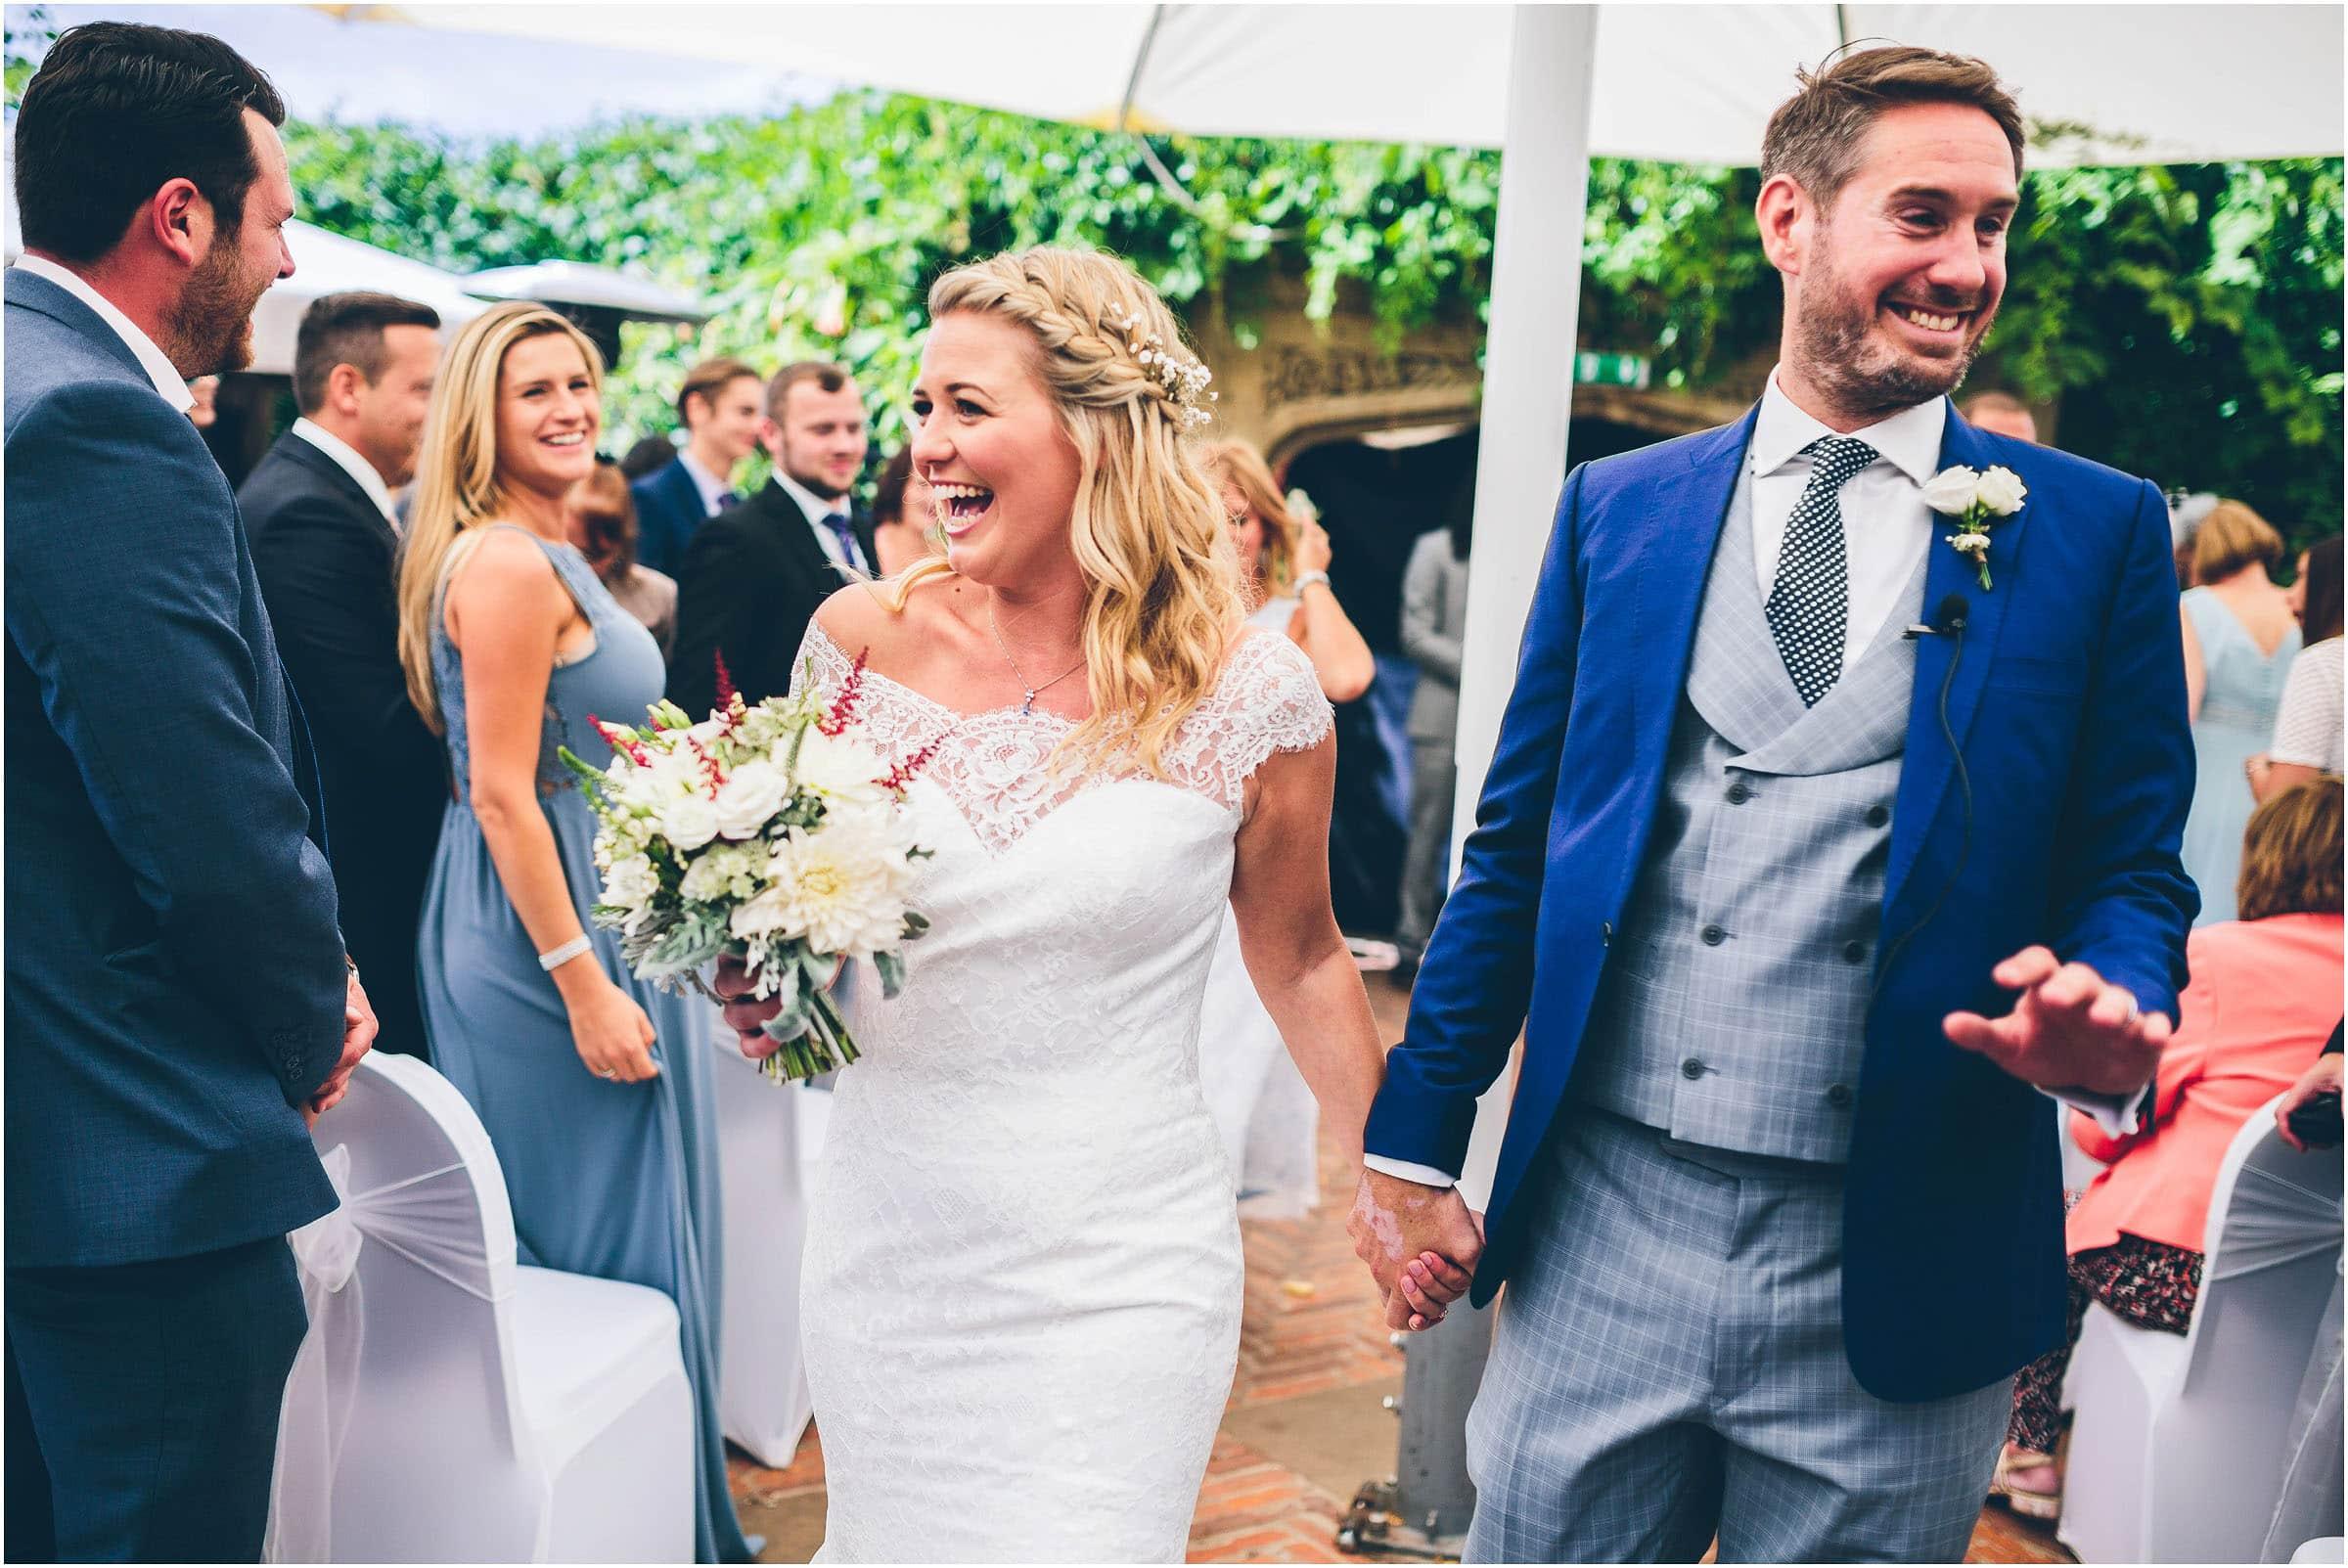 Kensington_Roof_Gardens_Wedding_Photography_0041